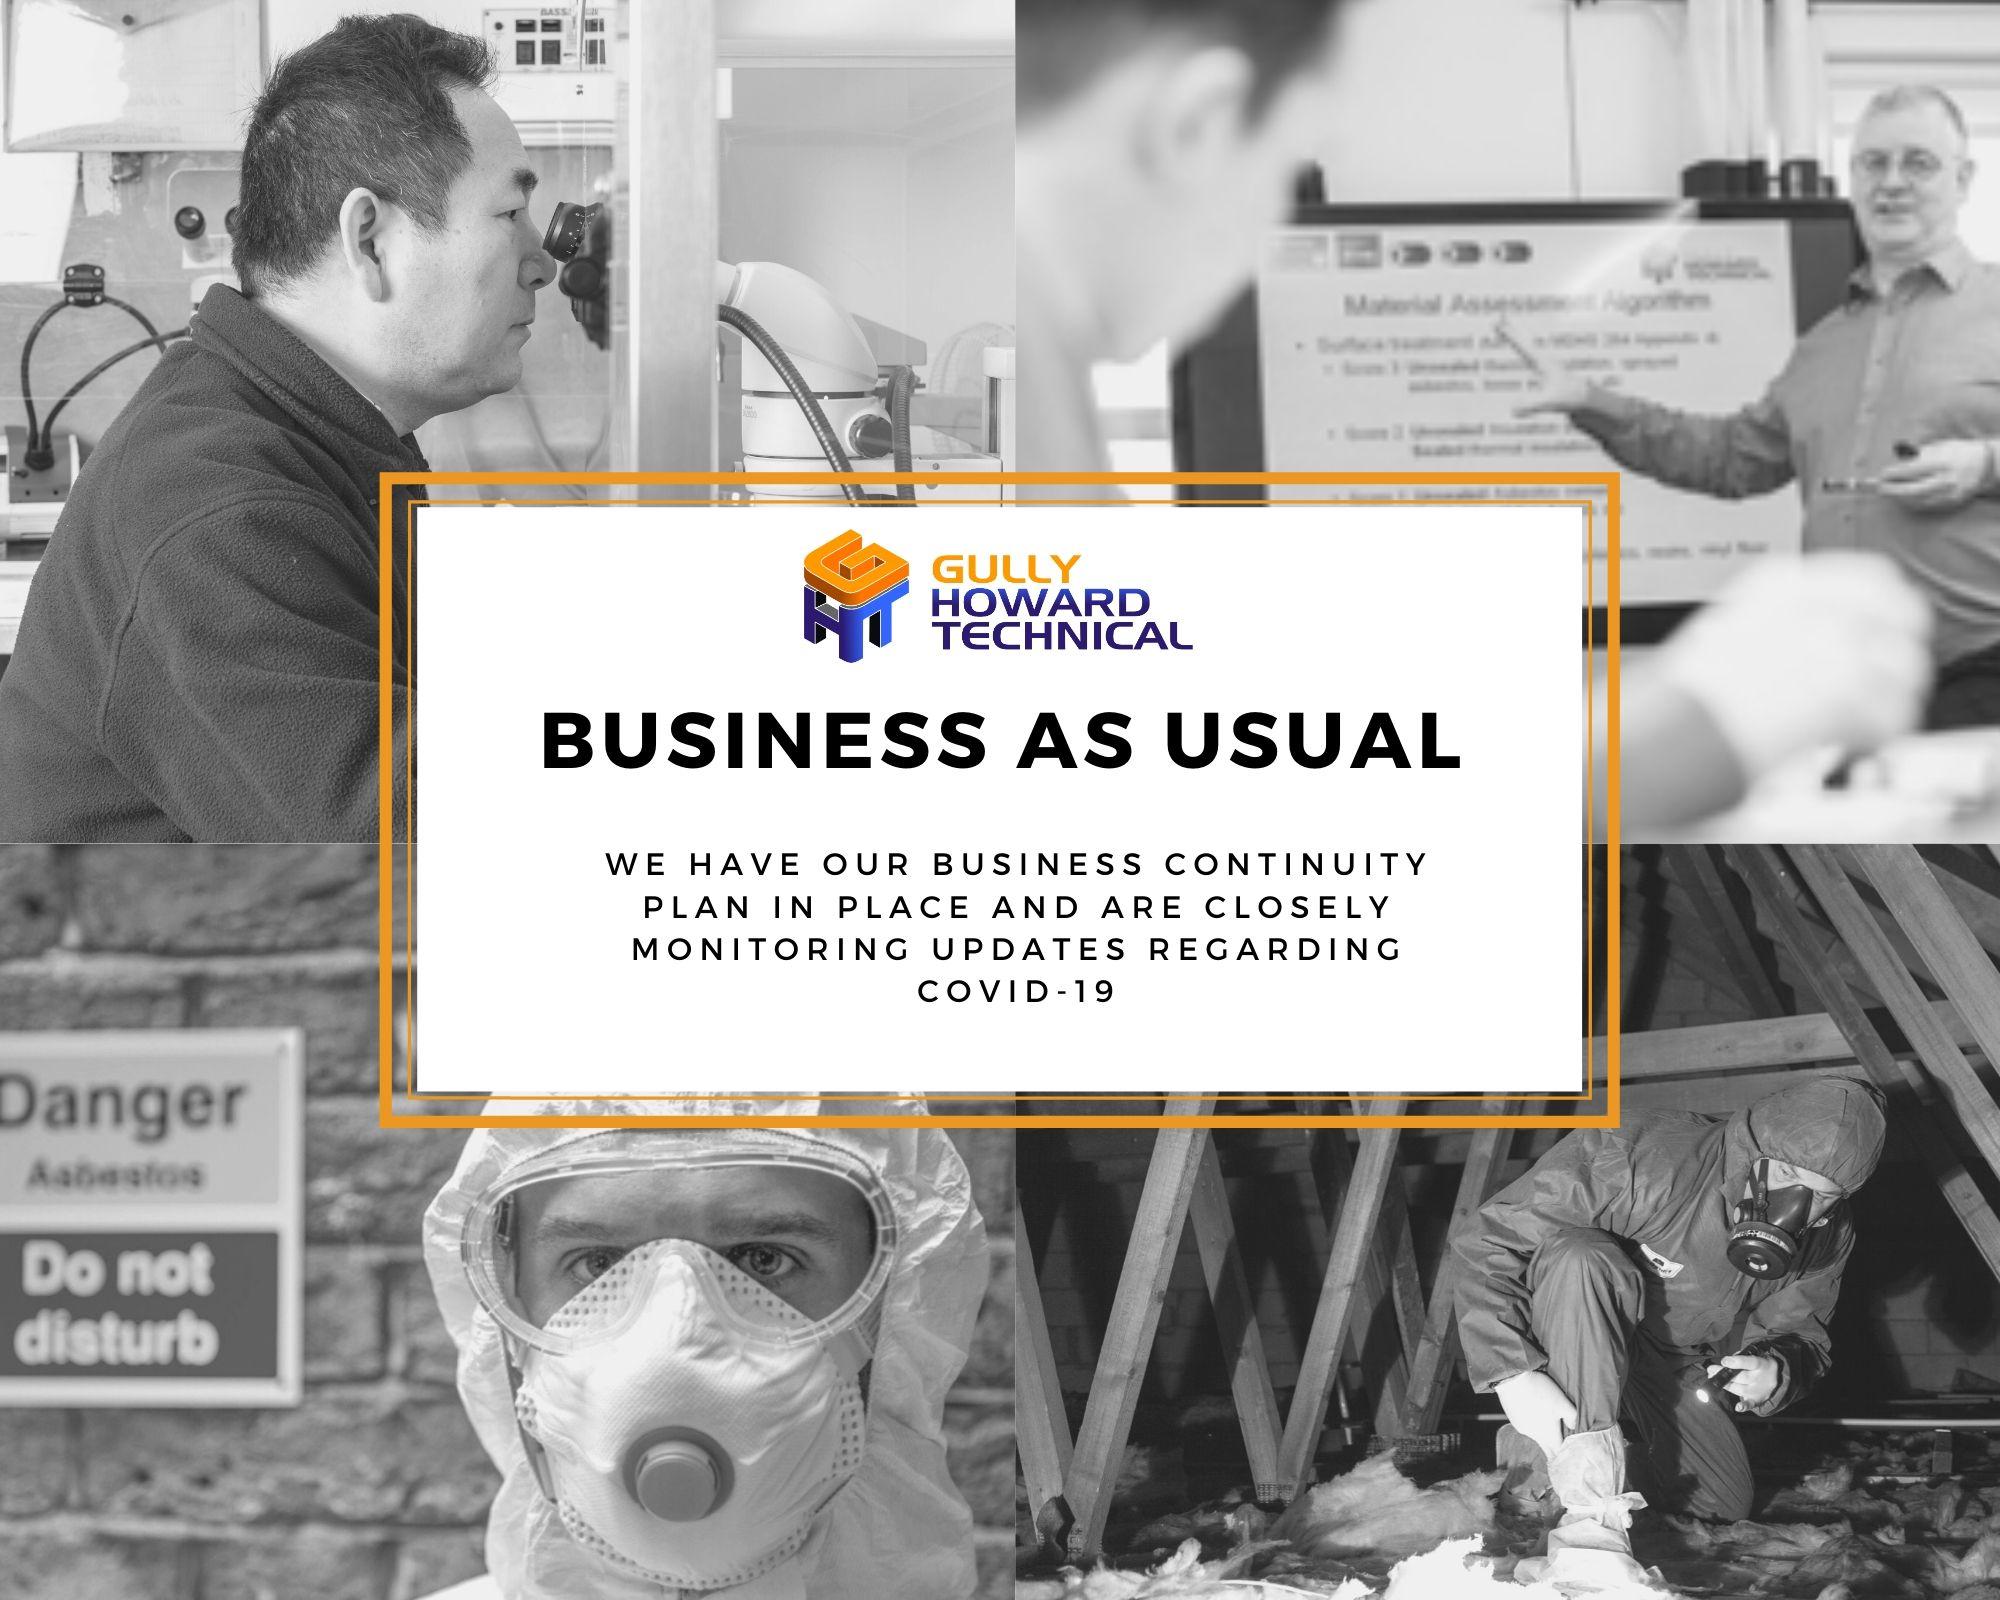 BUSINESS UPDATE REGARDING COVID-19